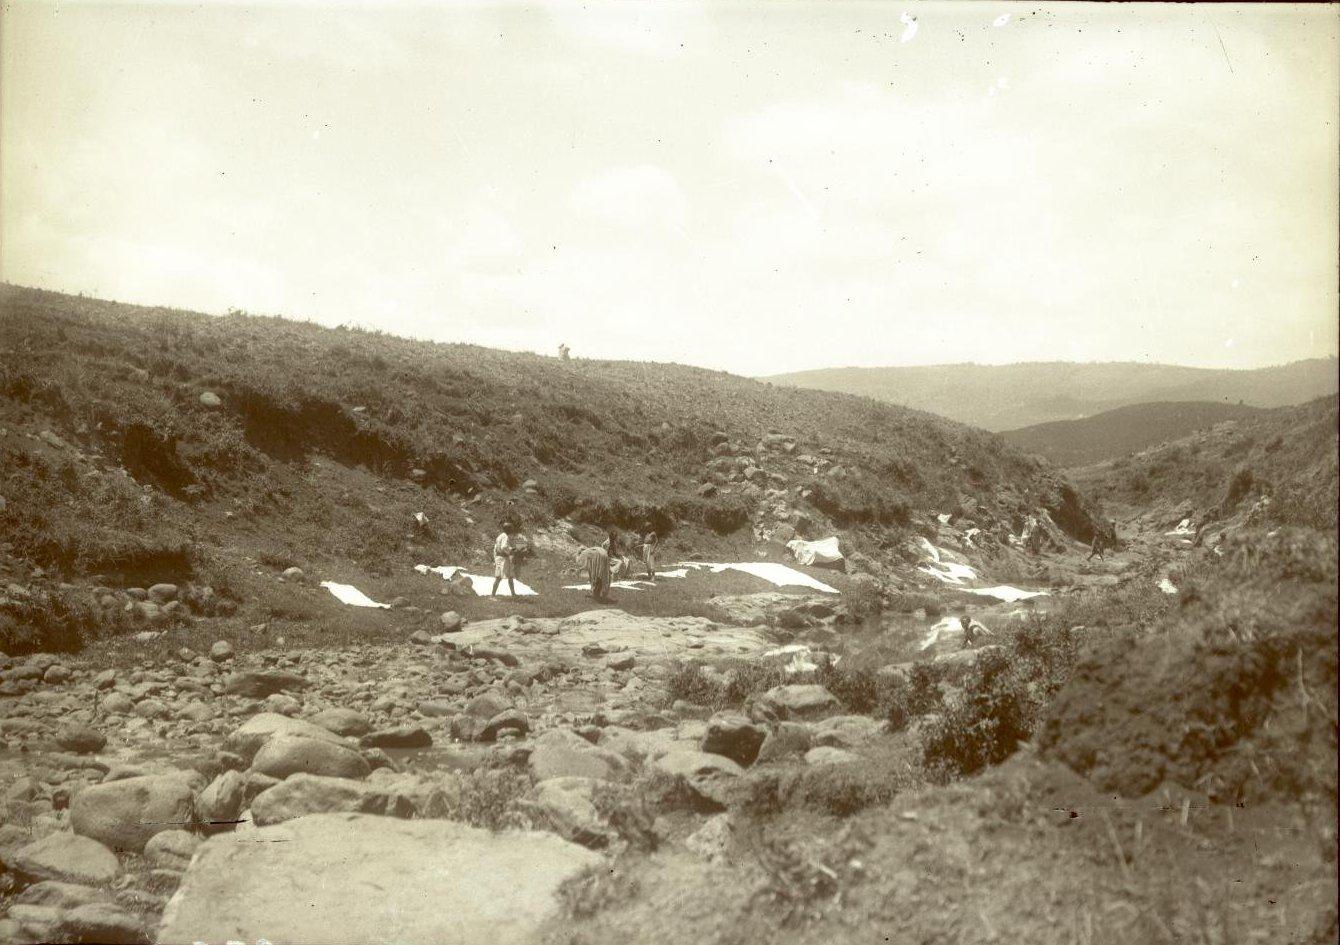 325. 1899. Абиссиния. г. Аддис-Абеба. Стирка на реке Кабана